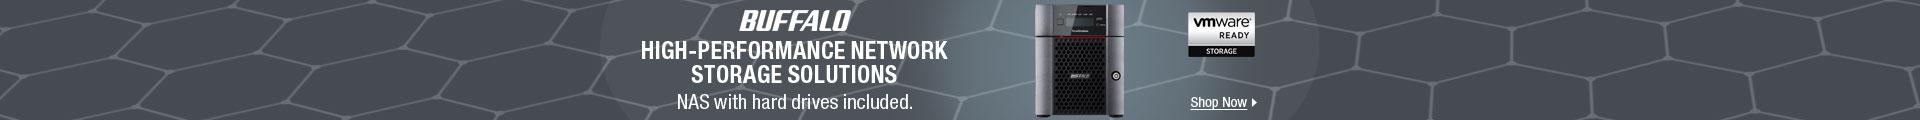 High-performance network storage solution